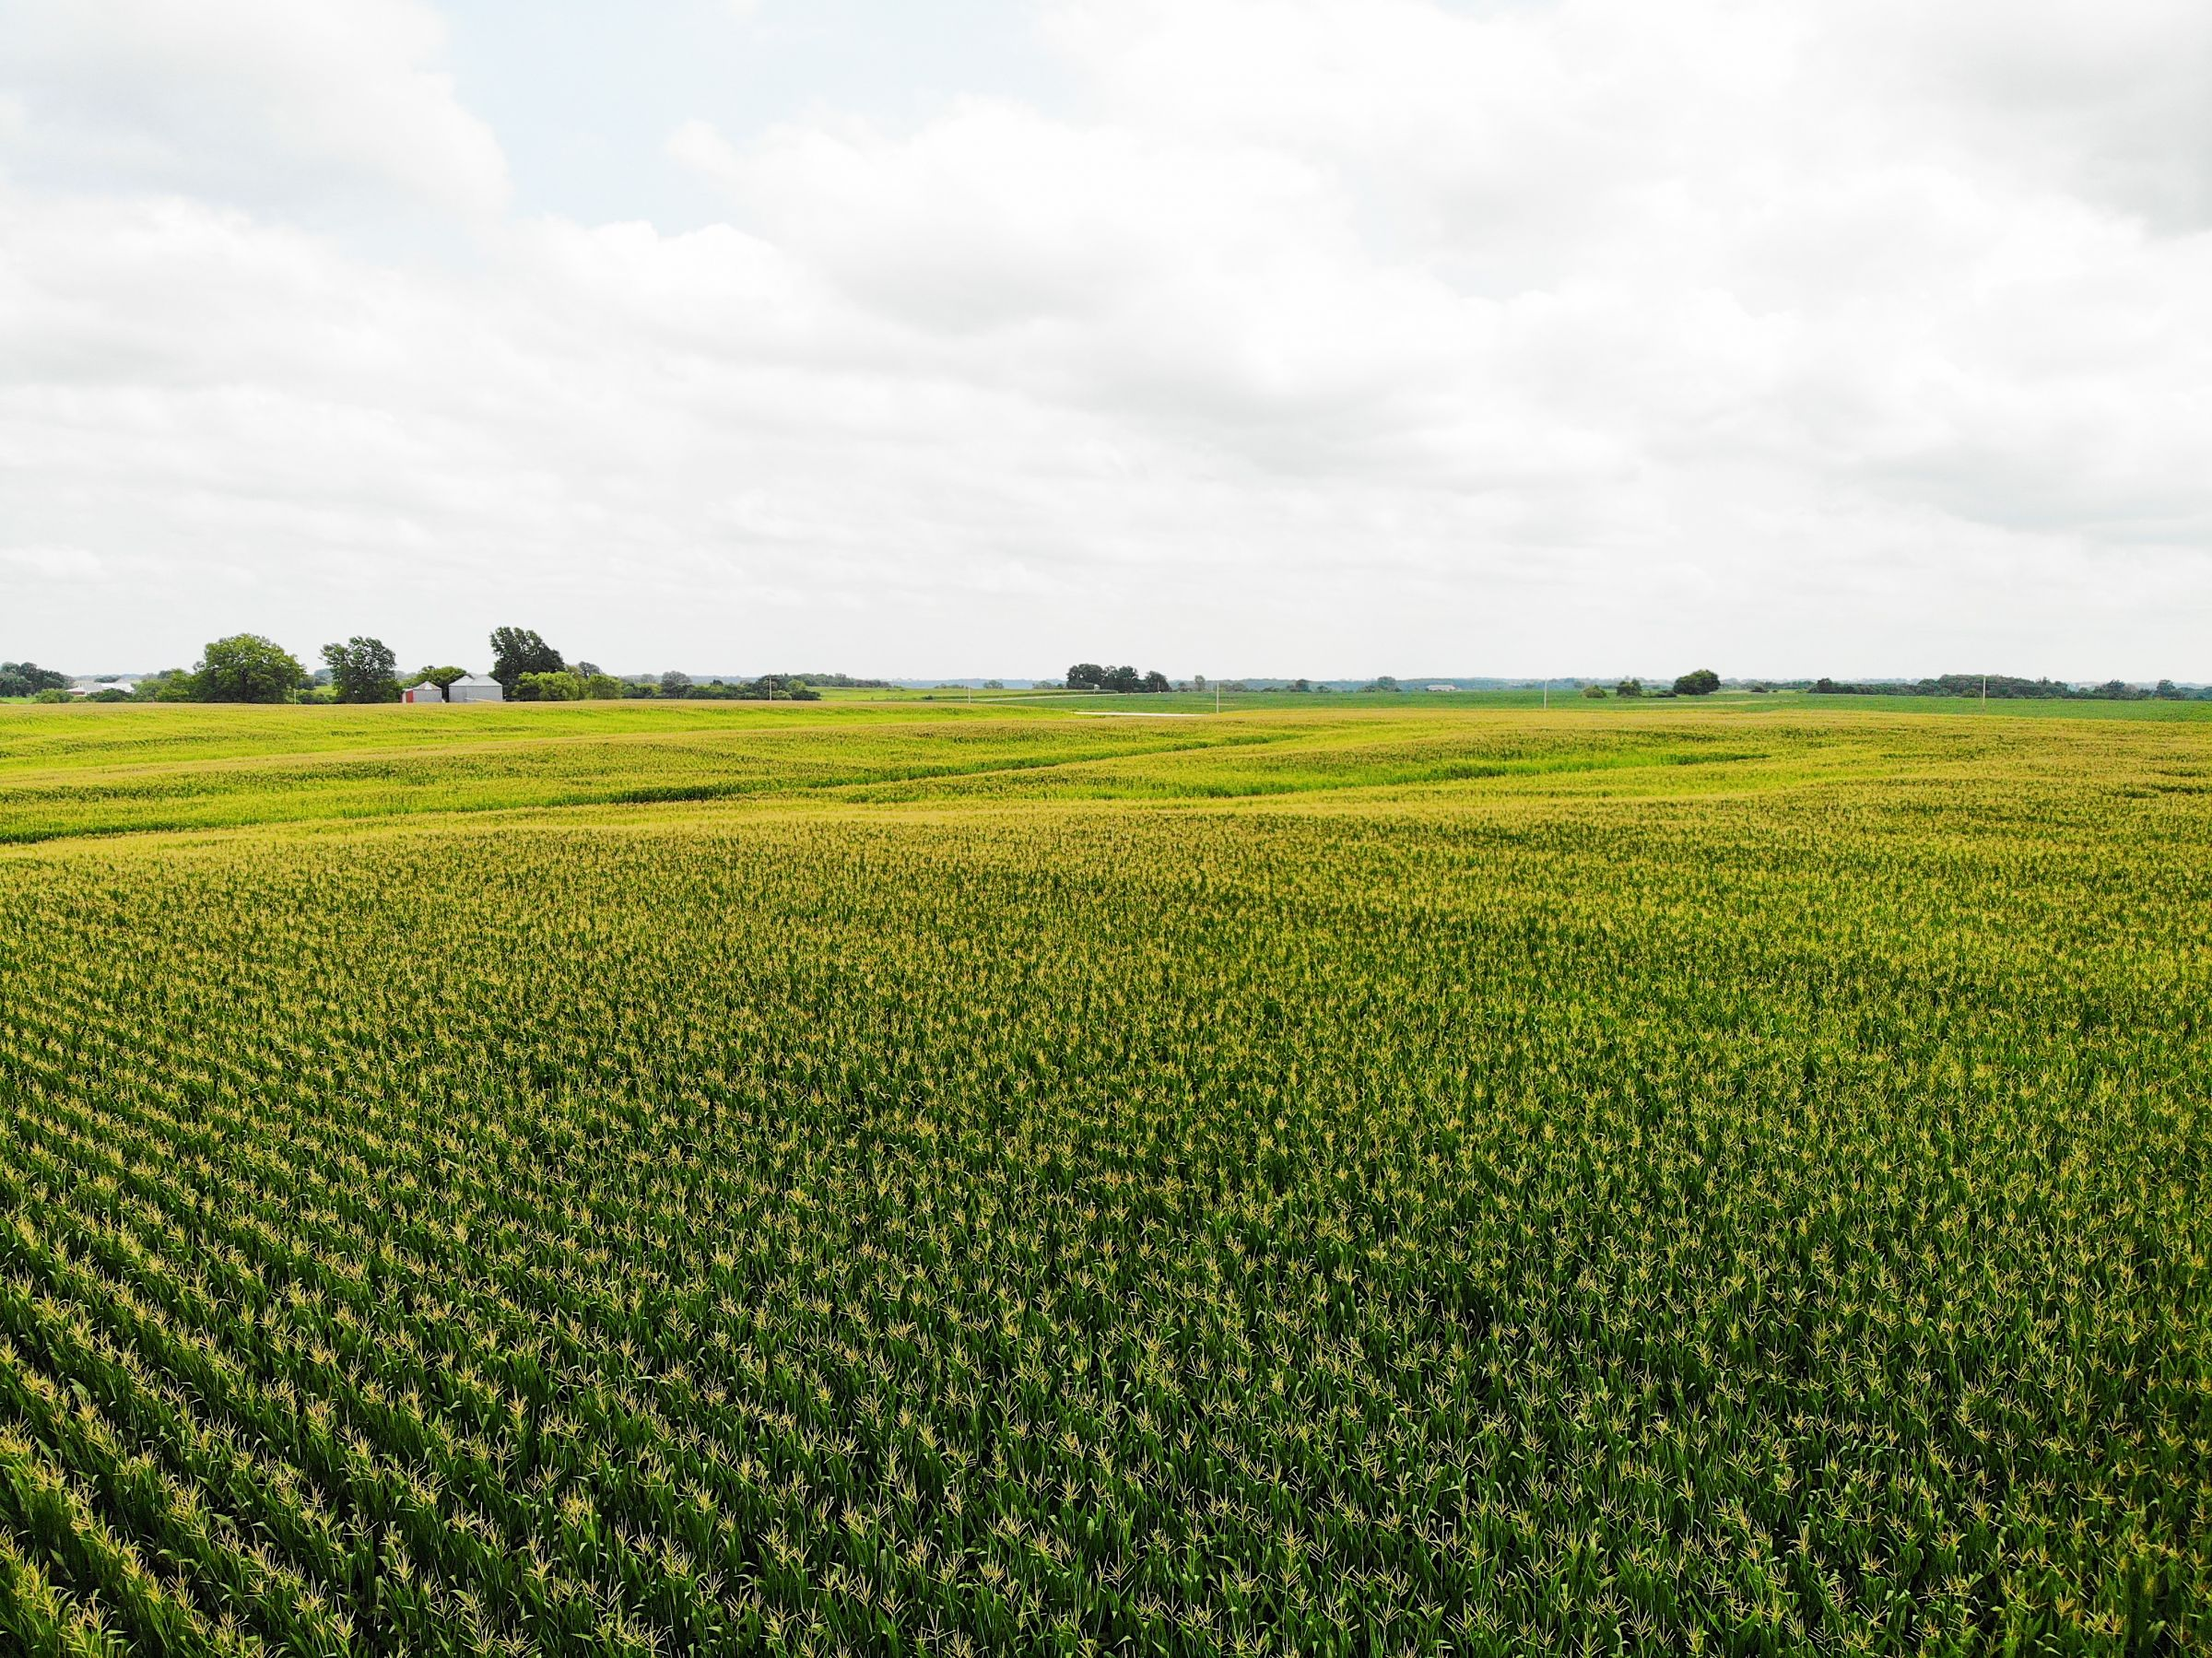 land-clarke-county-iowa-72-acres-listing-number-15106-6-2020-08-09-034308.jpg